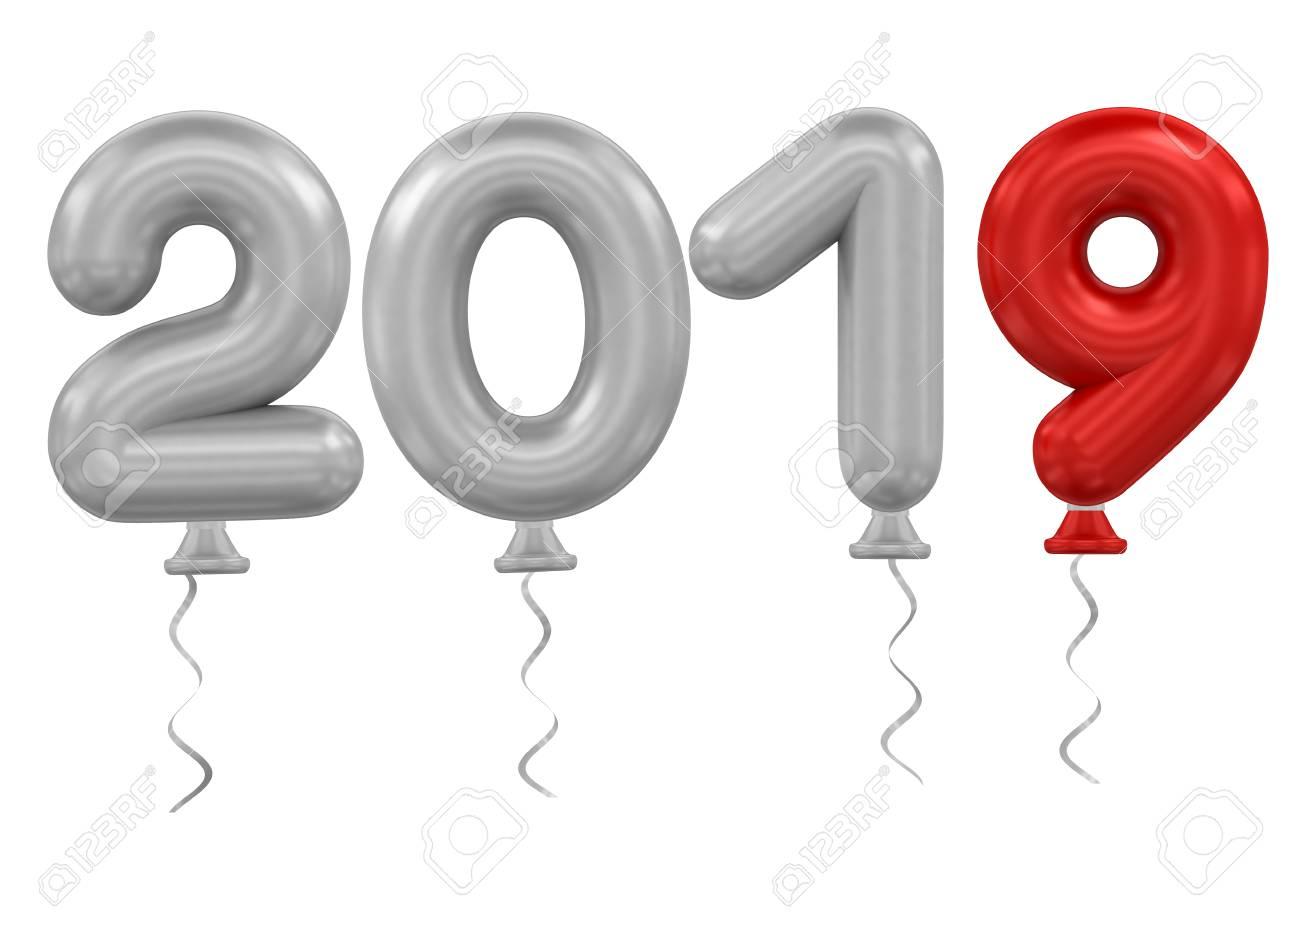 3d Rendering Model 2019 Balloons On White Background Stock Photo